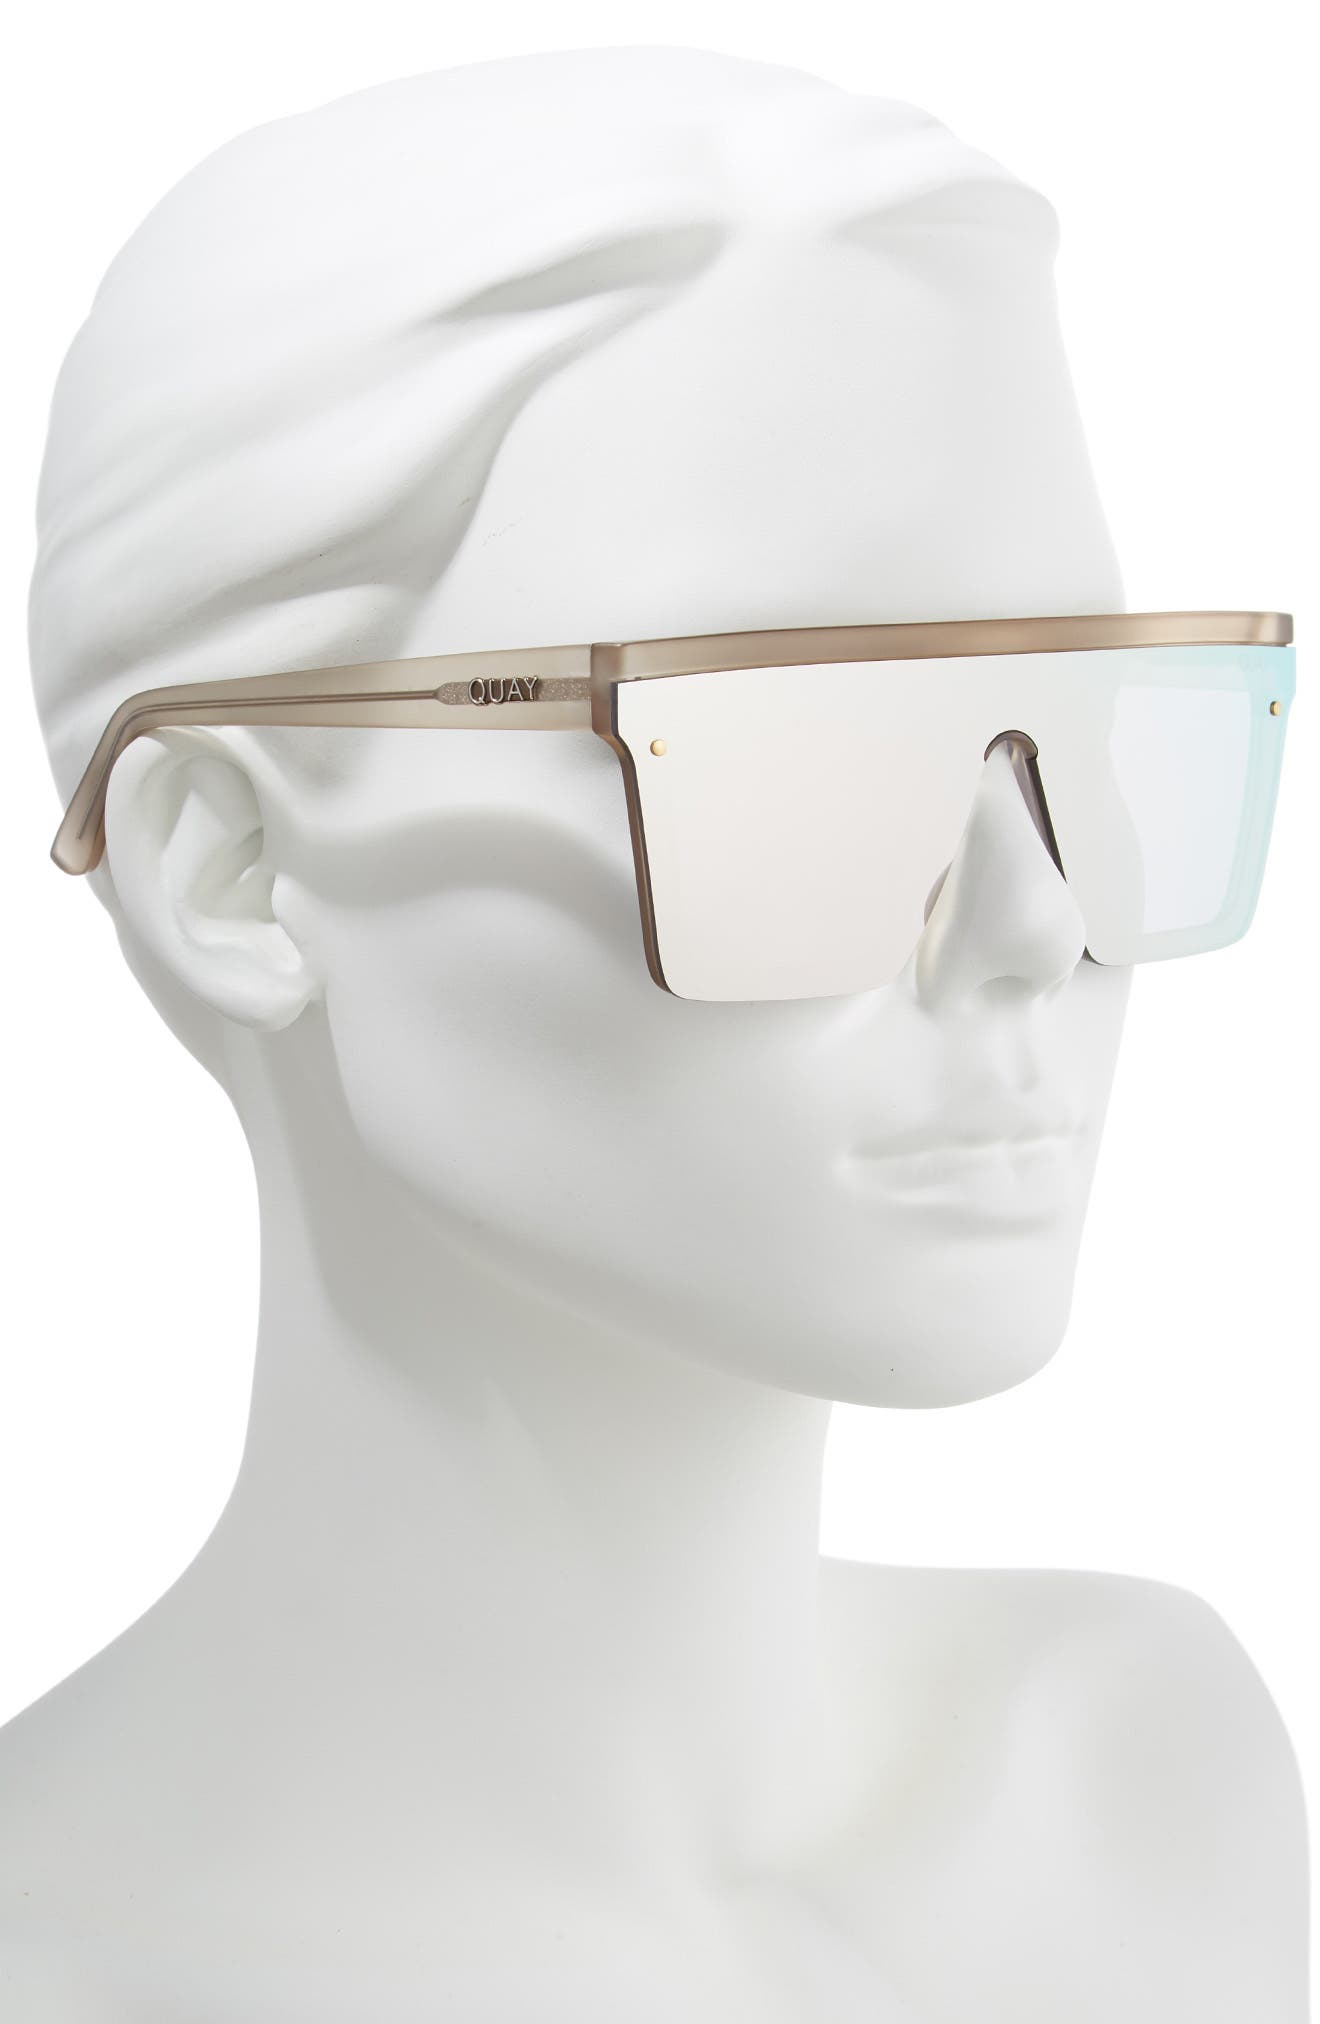 Hindsight 150mm Shield Sunglasses,                             Alternate thumbnail 2, color,                             GOLD/ GOLD